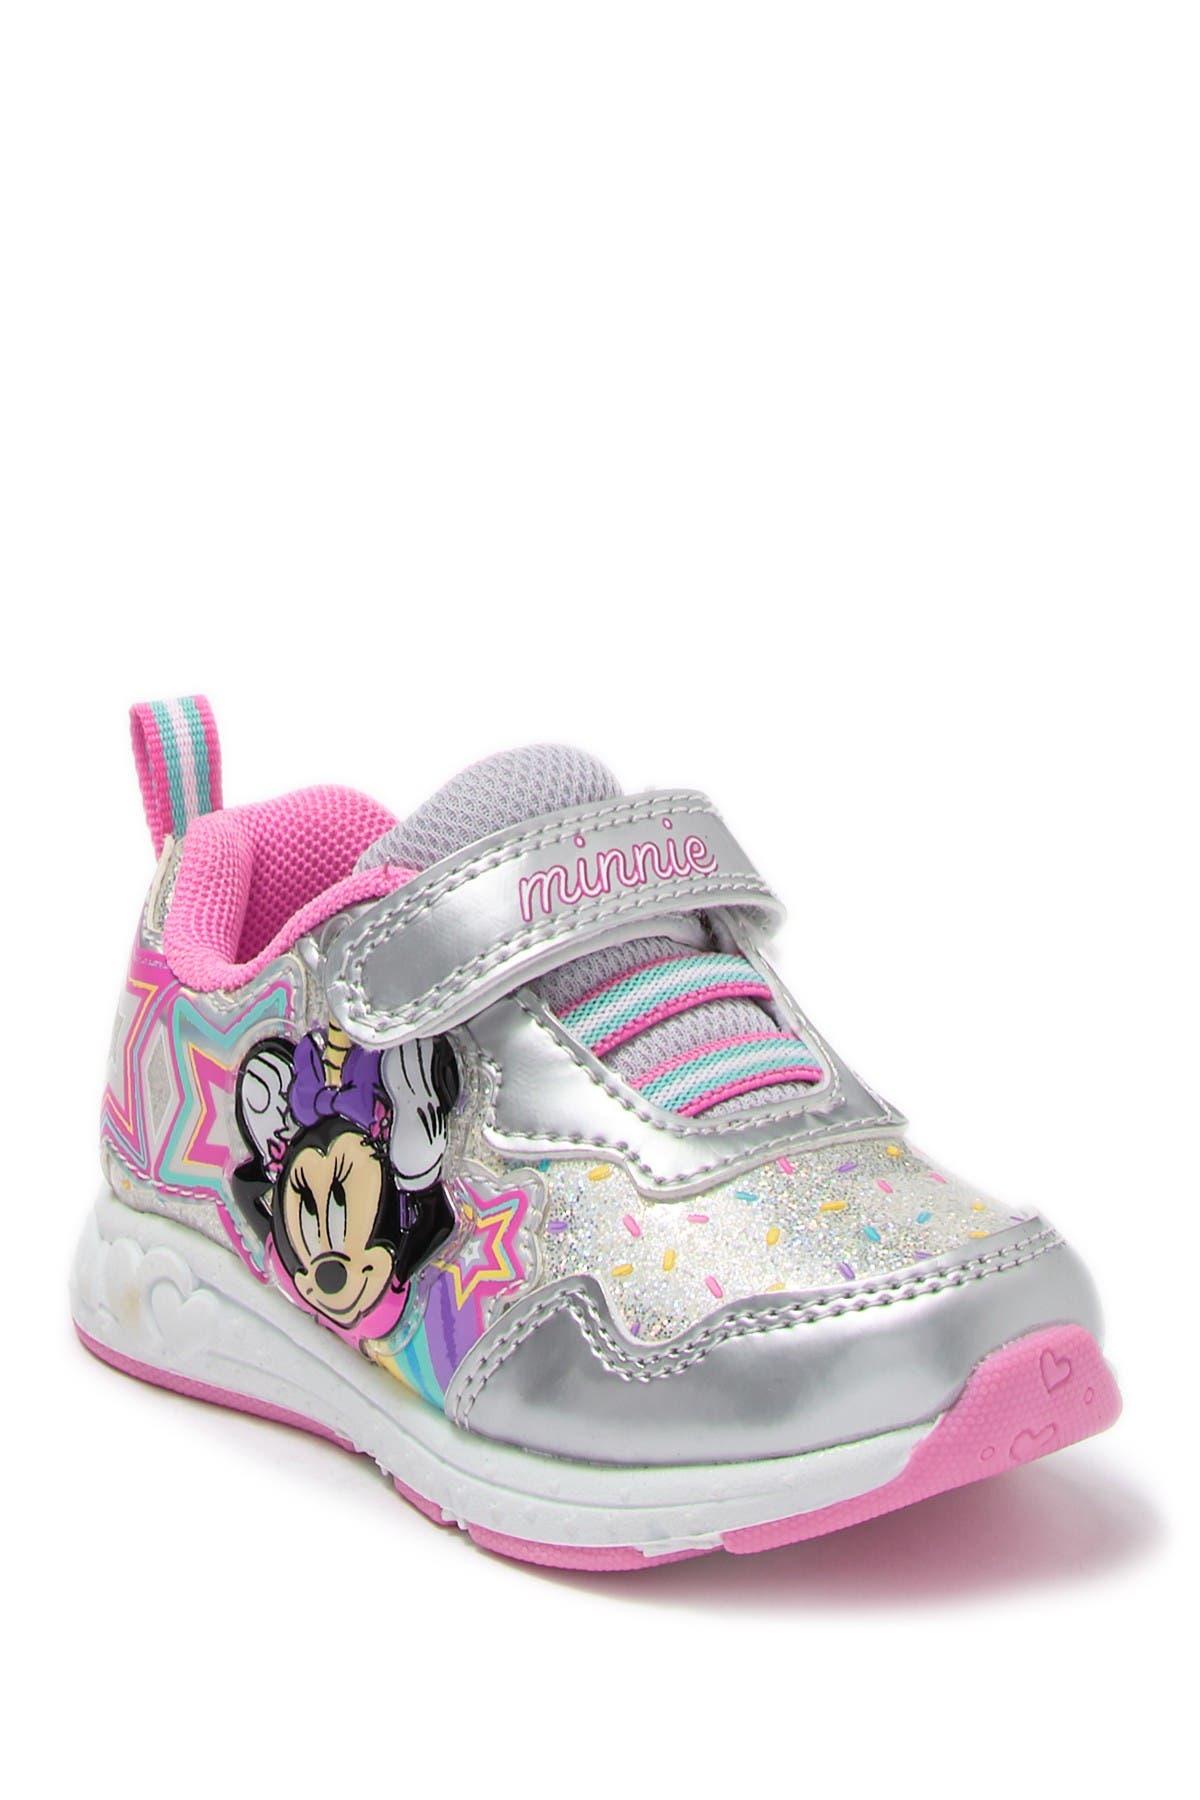 Josmo | Minnie Mouse Sneaker